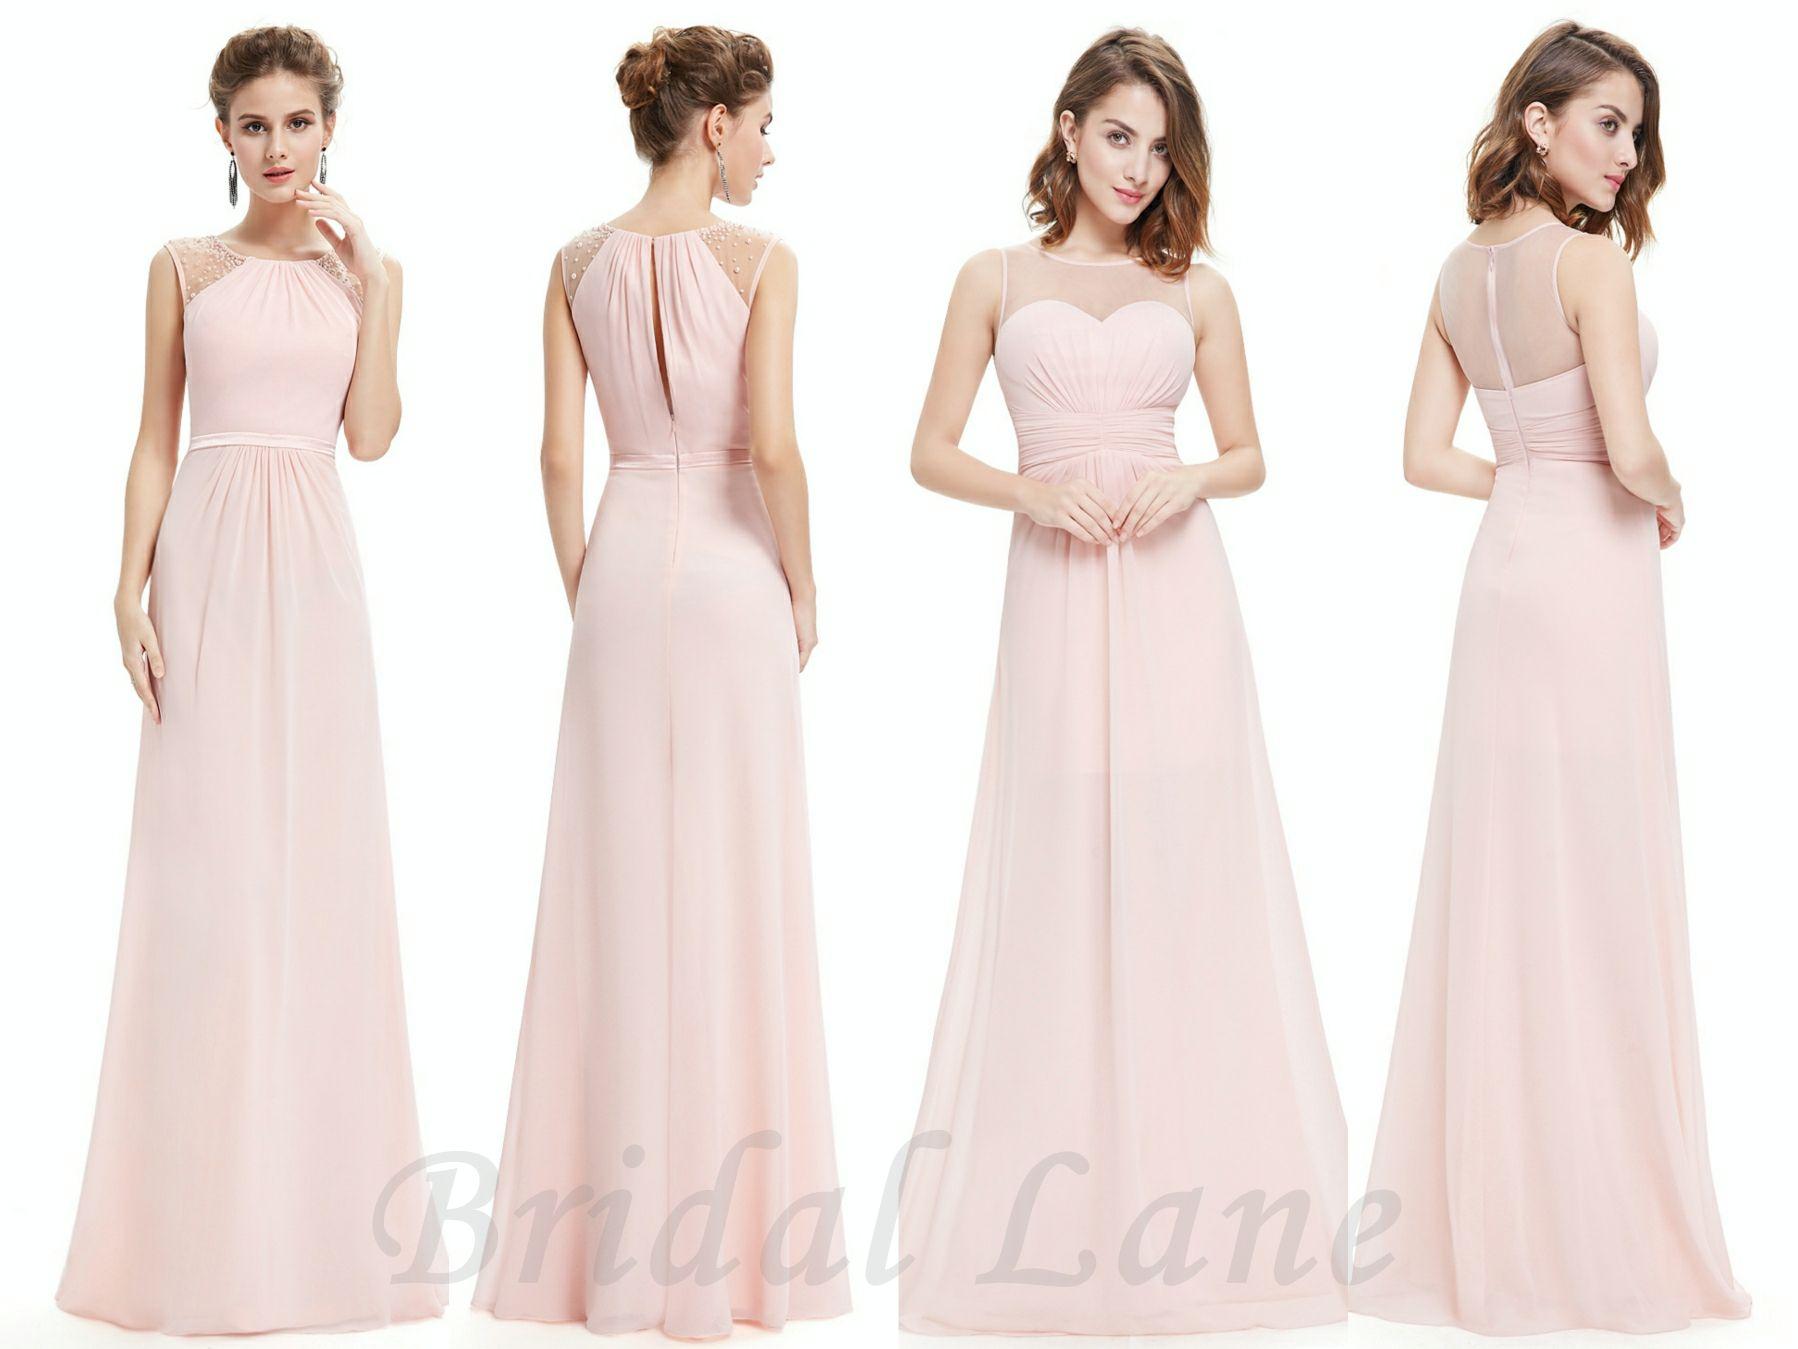 Fullsize Of Blush Pink Bridesmaid Dresses